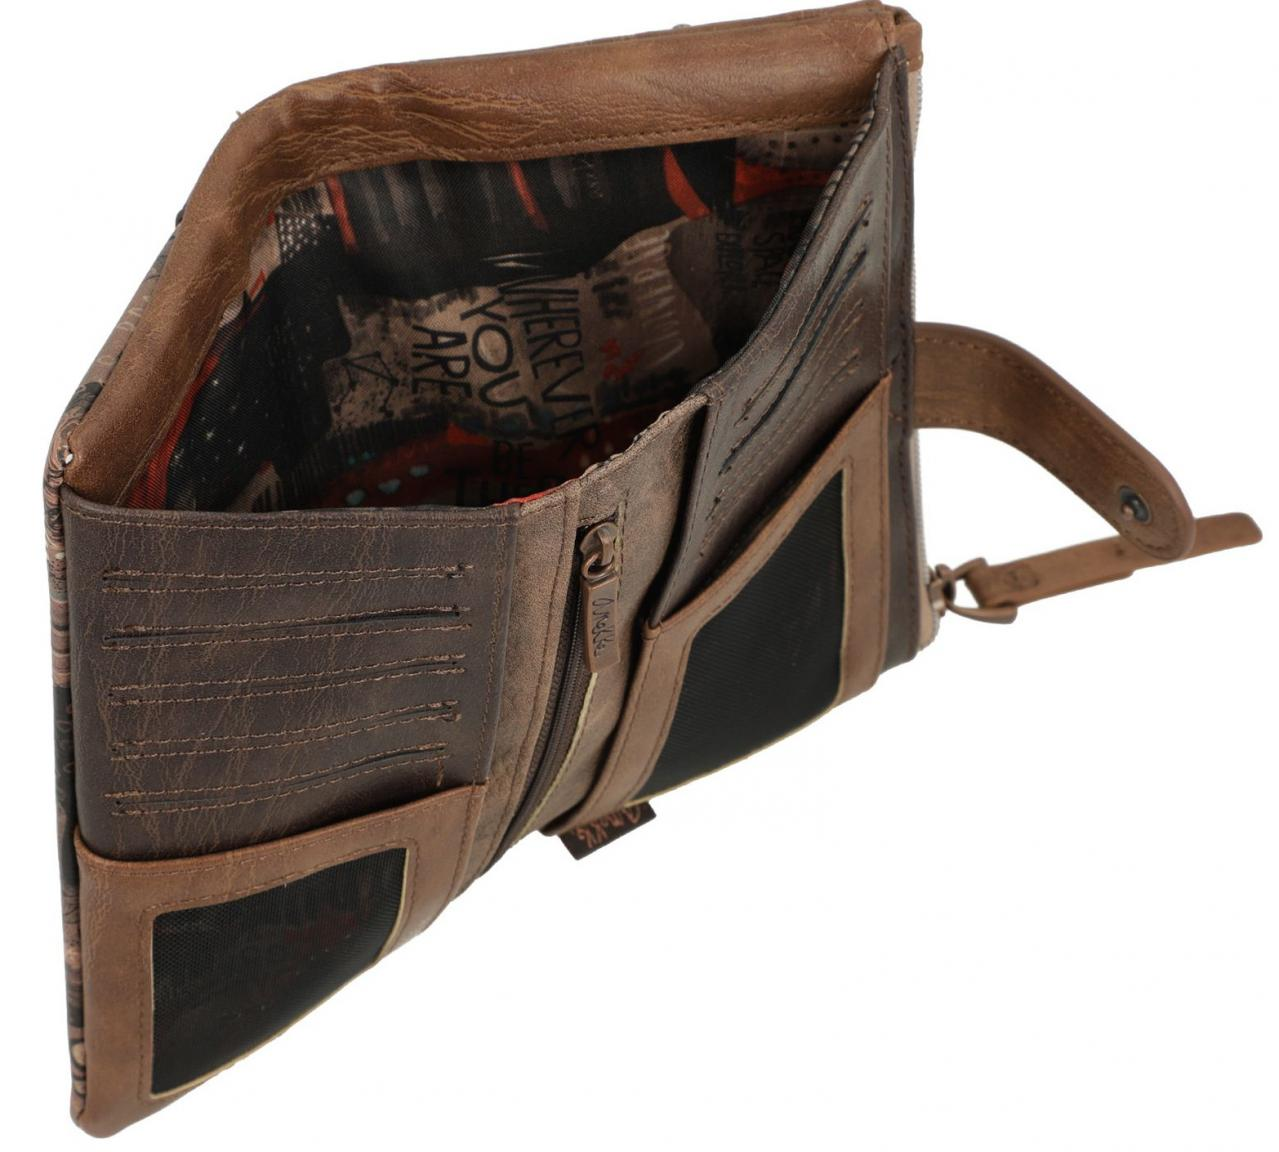 Geldbörse Damen braun Nature Anekke 50% recyceltes Material